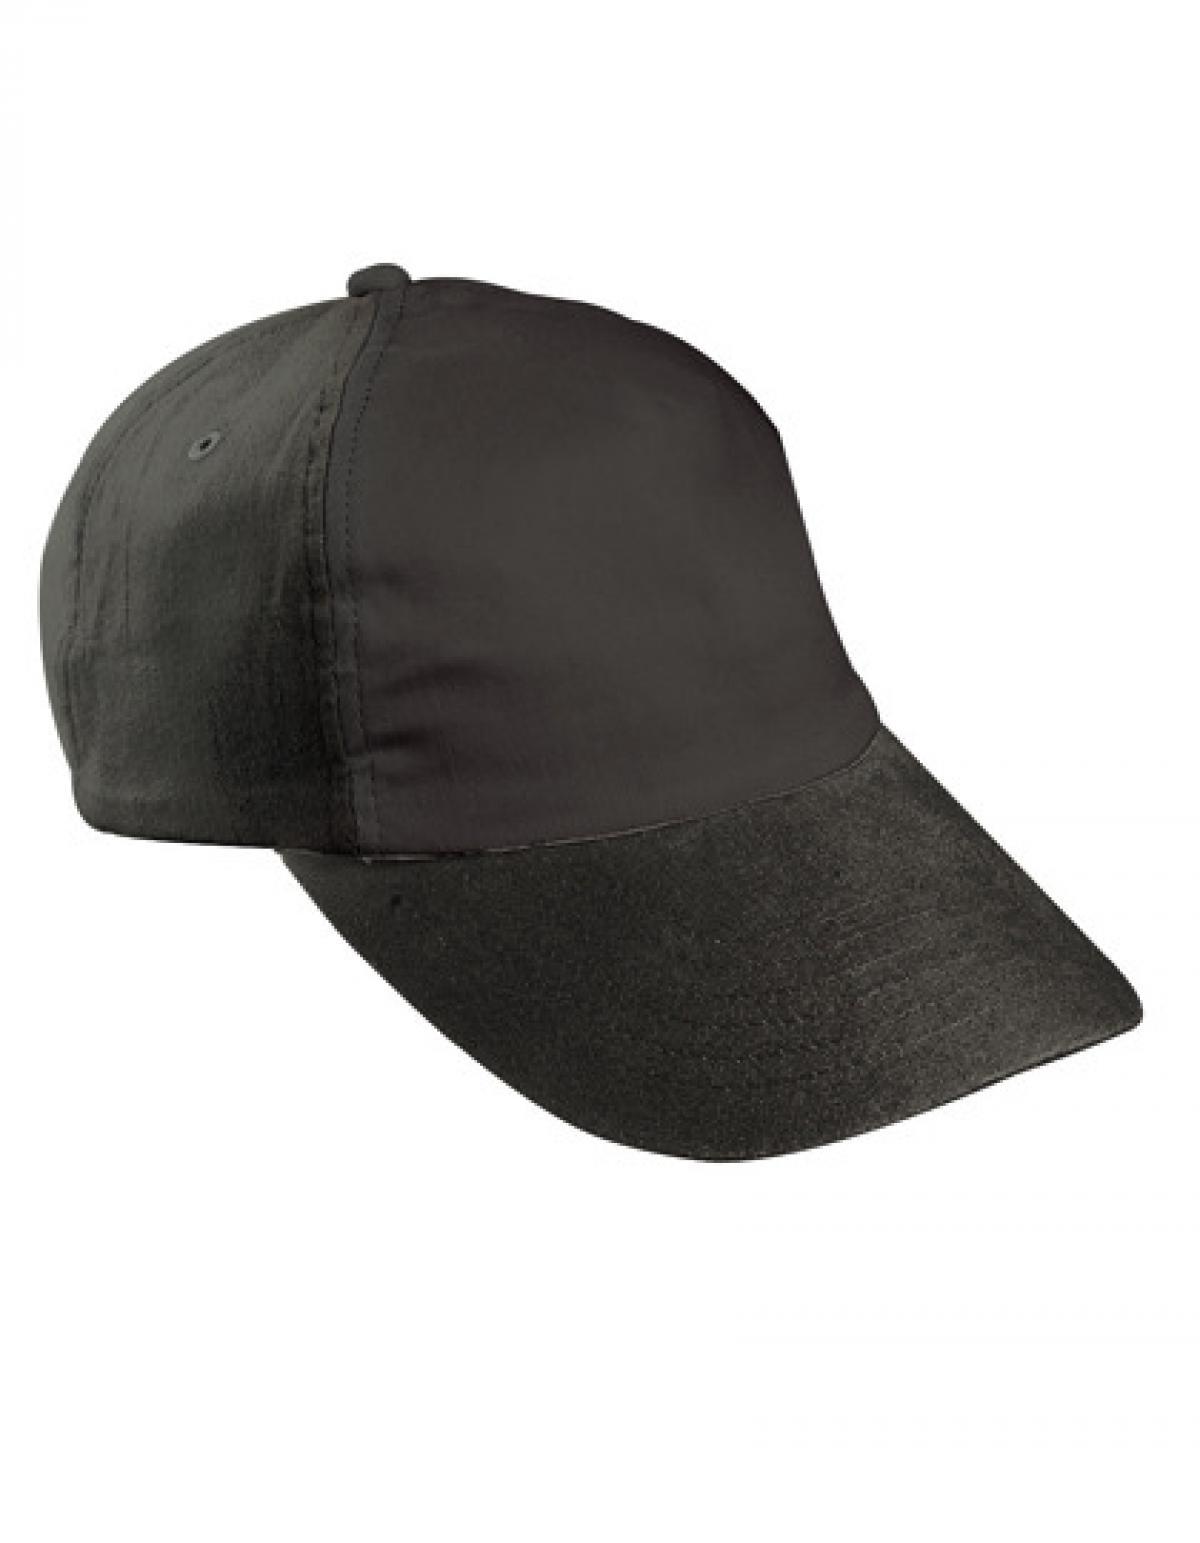 Myrtle Beach Racing Cap Kappe Mütze Hut